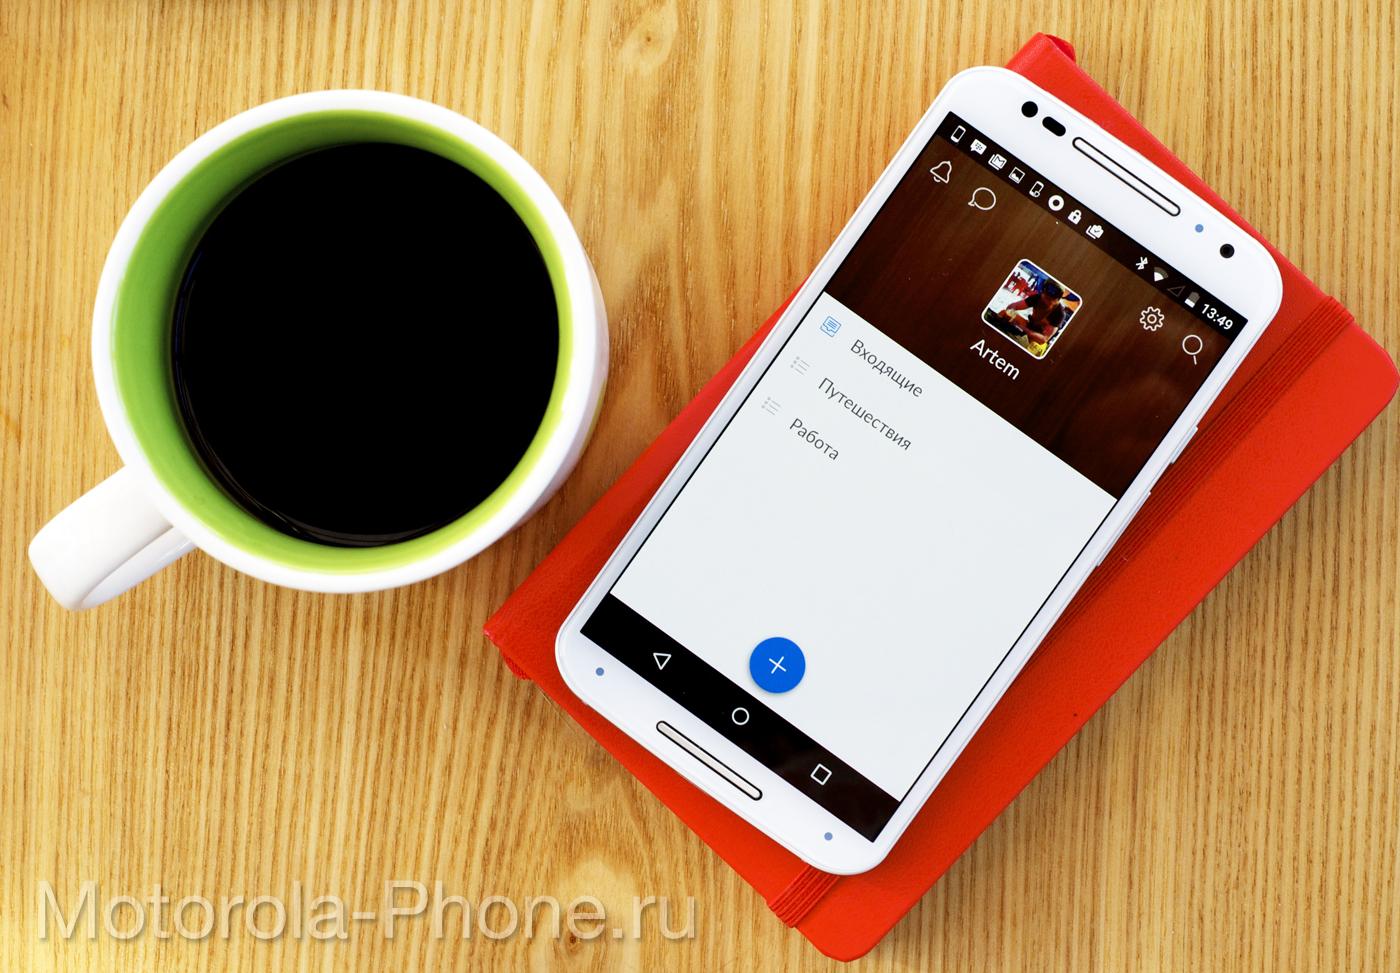 Motorola-Moto-X-WonderList